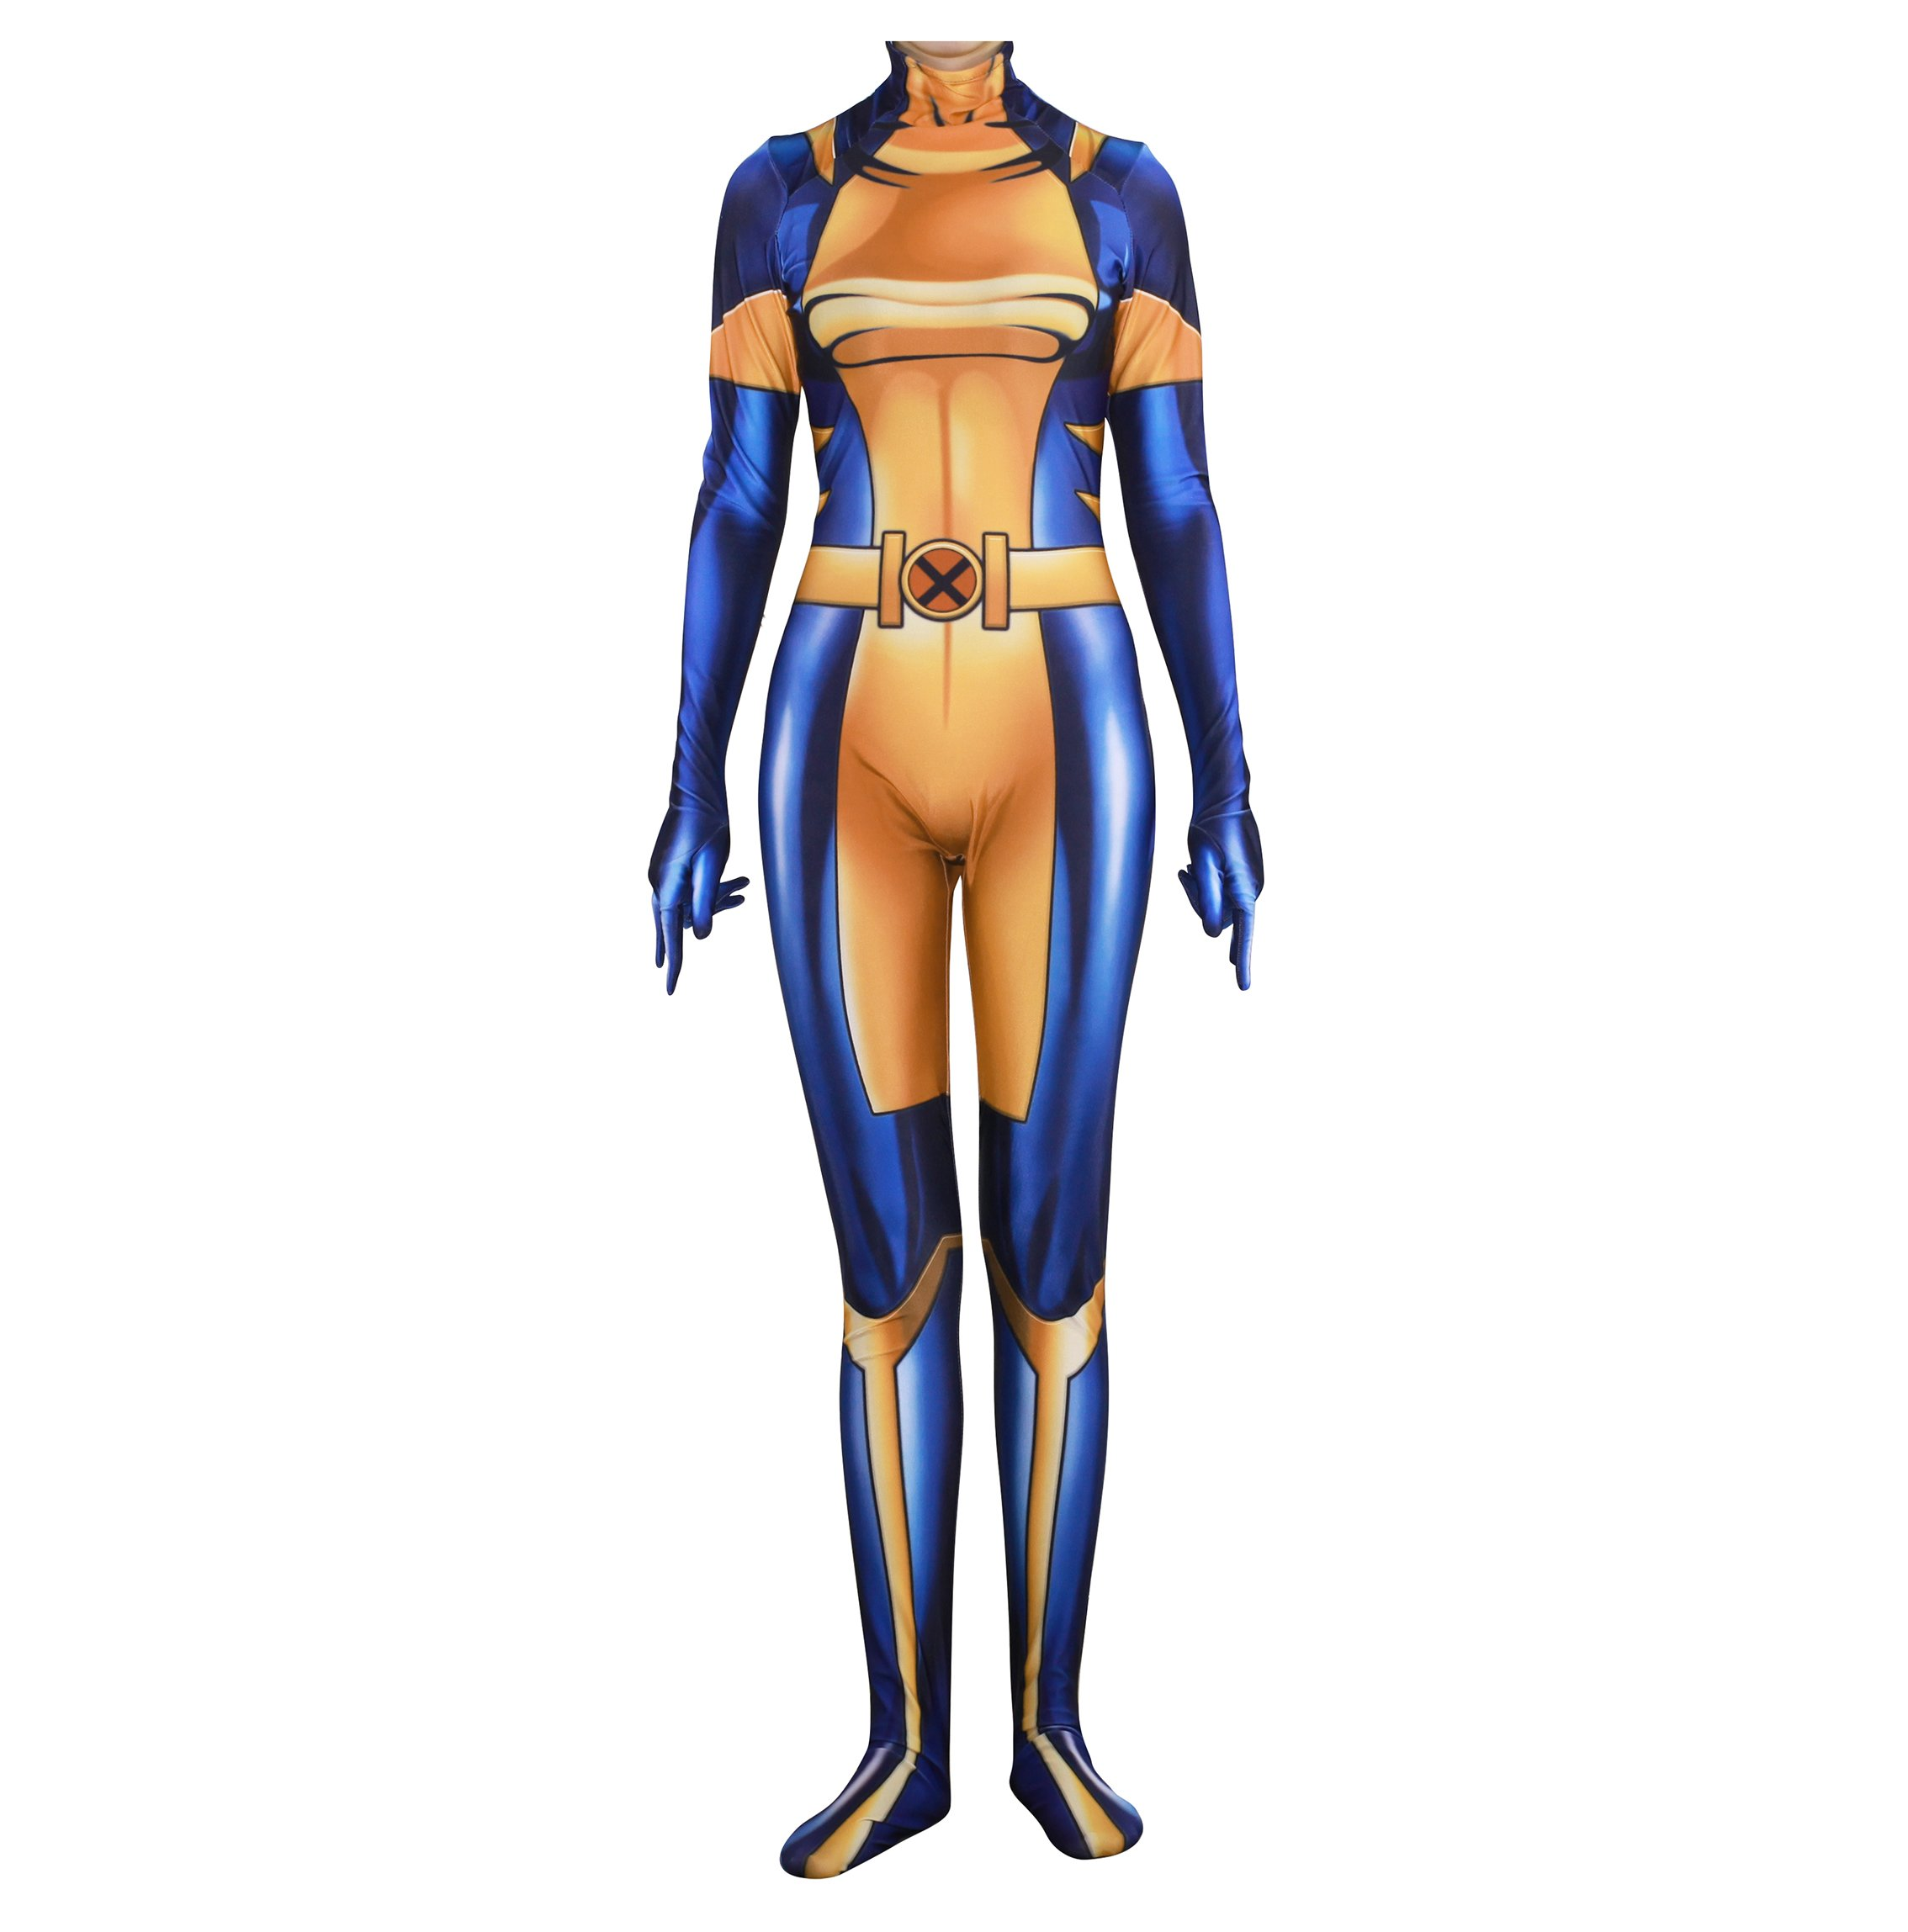 Rieknic Superhero Womens Spandex Zentai Bodysuit Halloween Cosplay Costumes Adult/Kids 3D Style 713hd6hxb9L